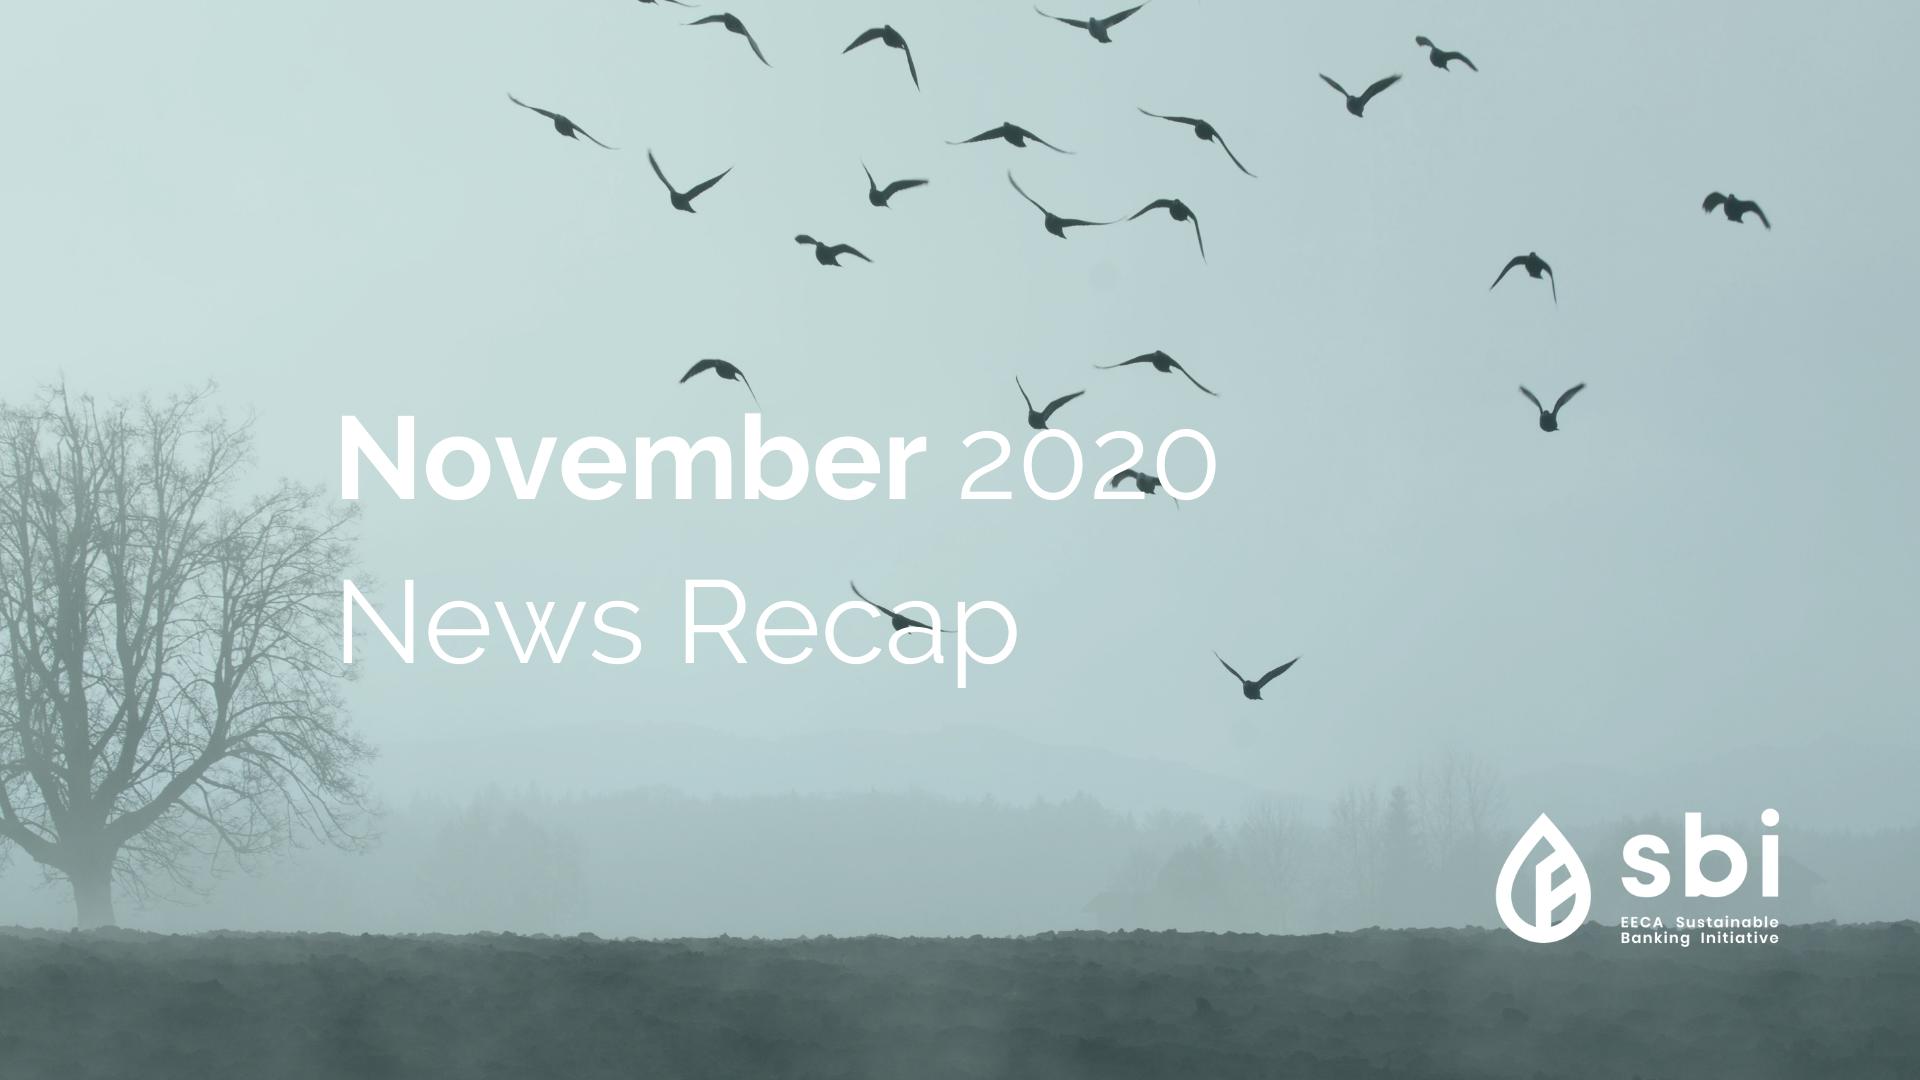 November 2020 News Recap